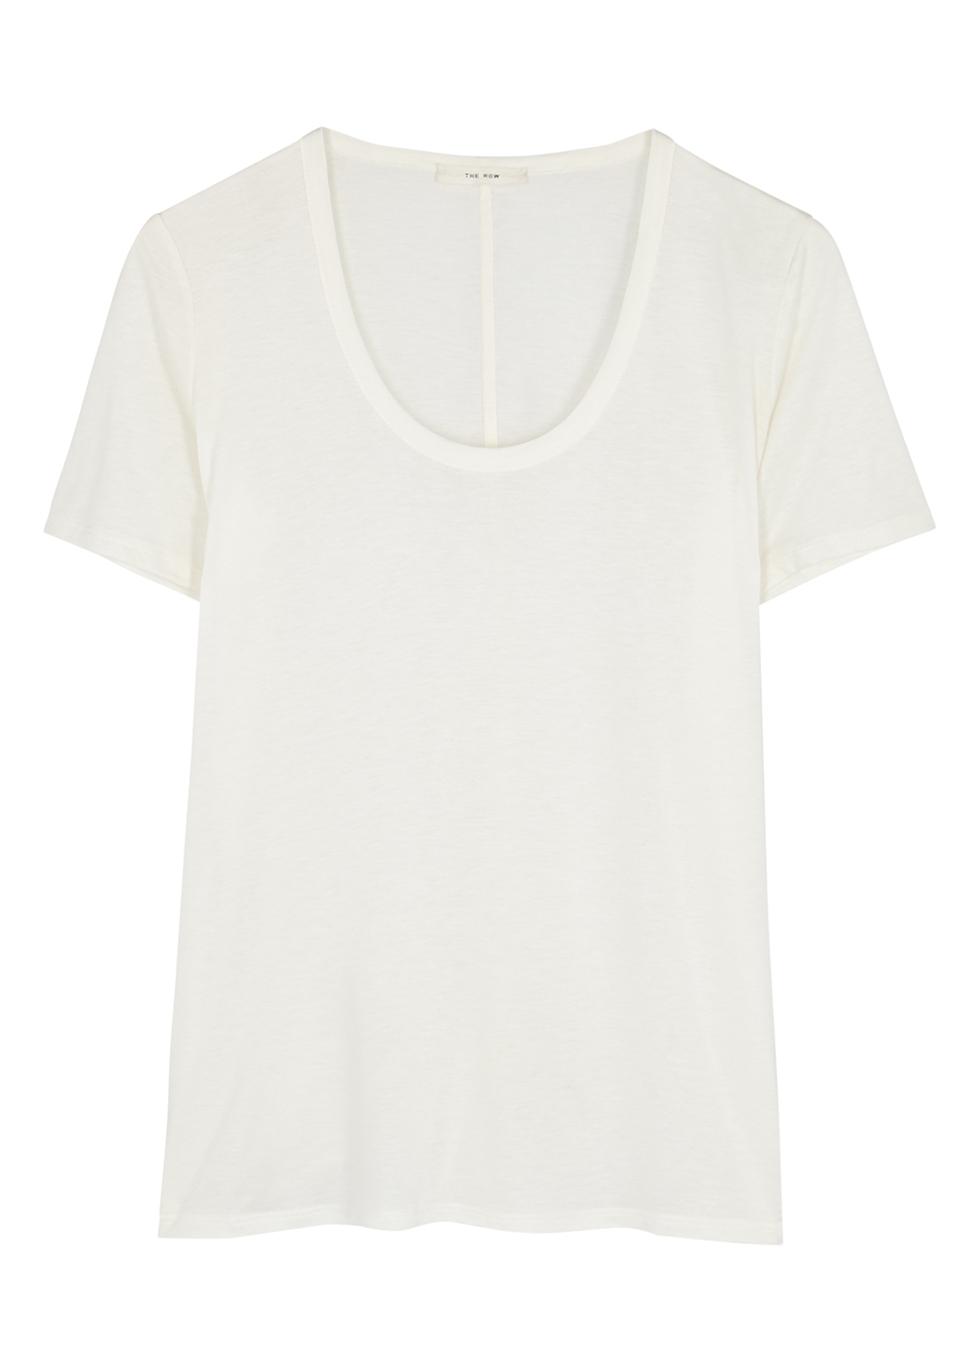 Stilton white stretch-jersey top